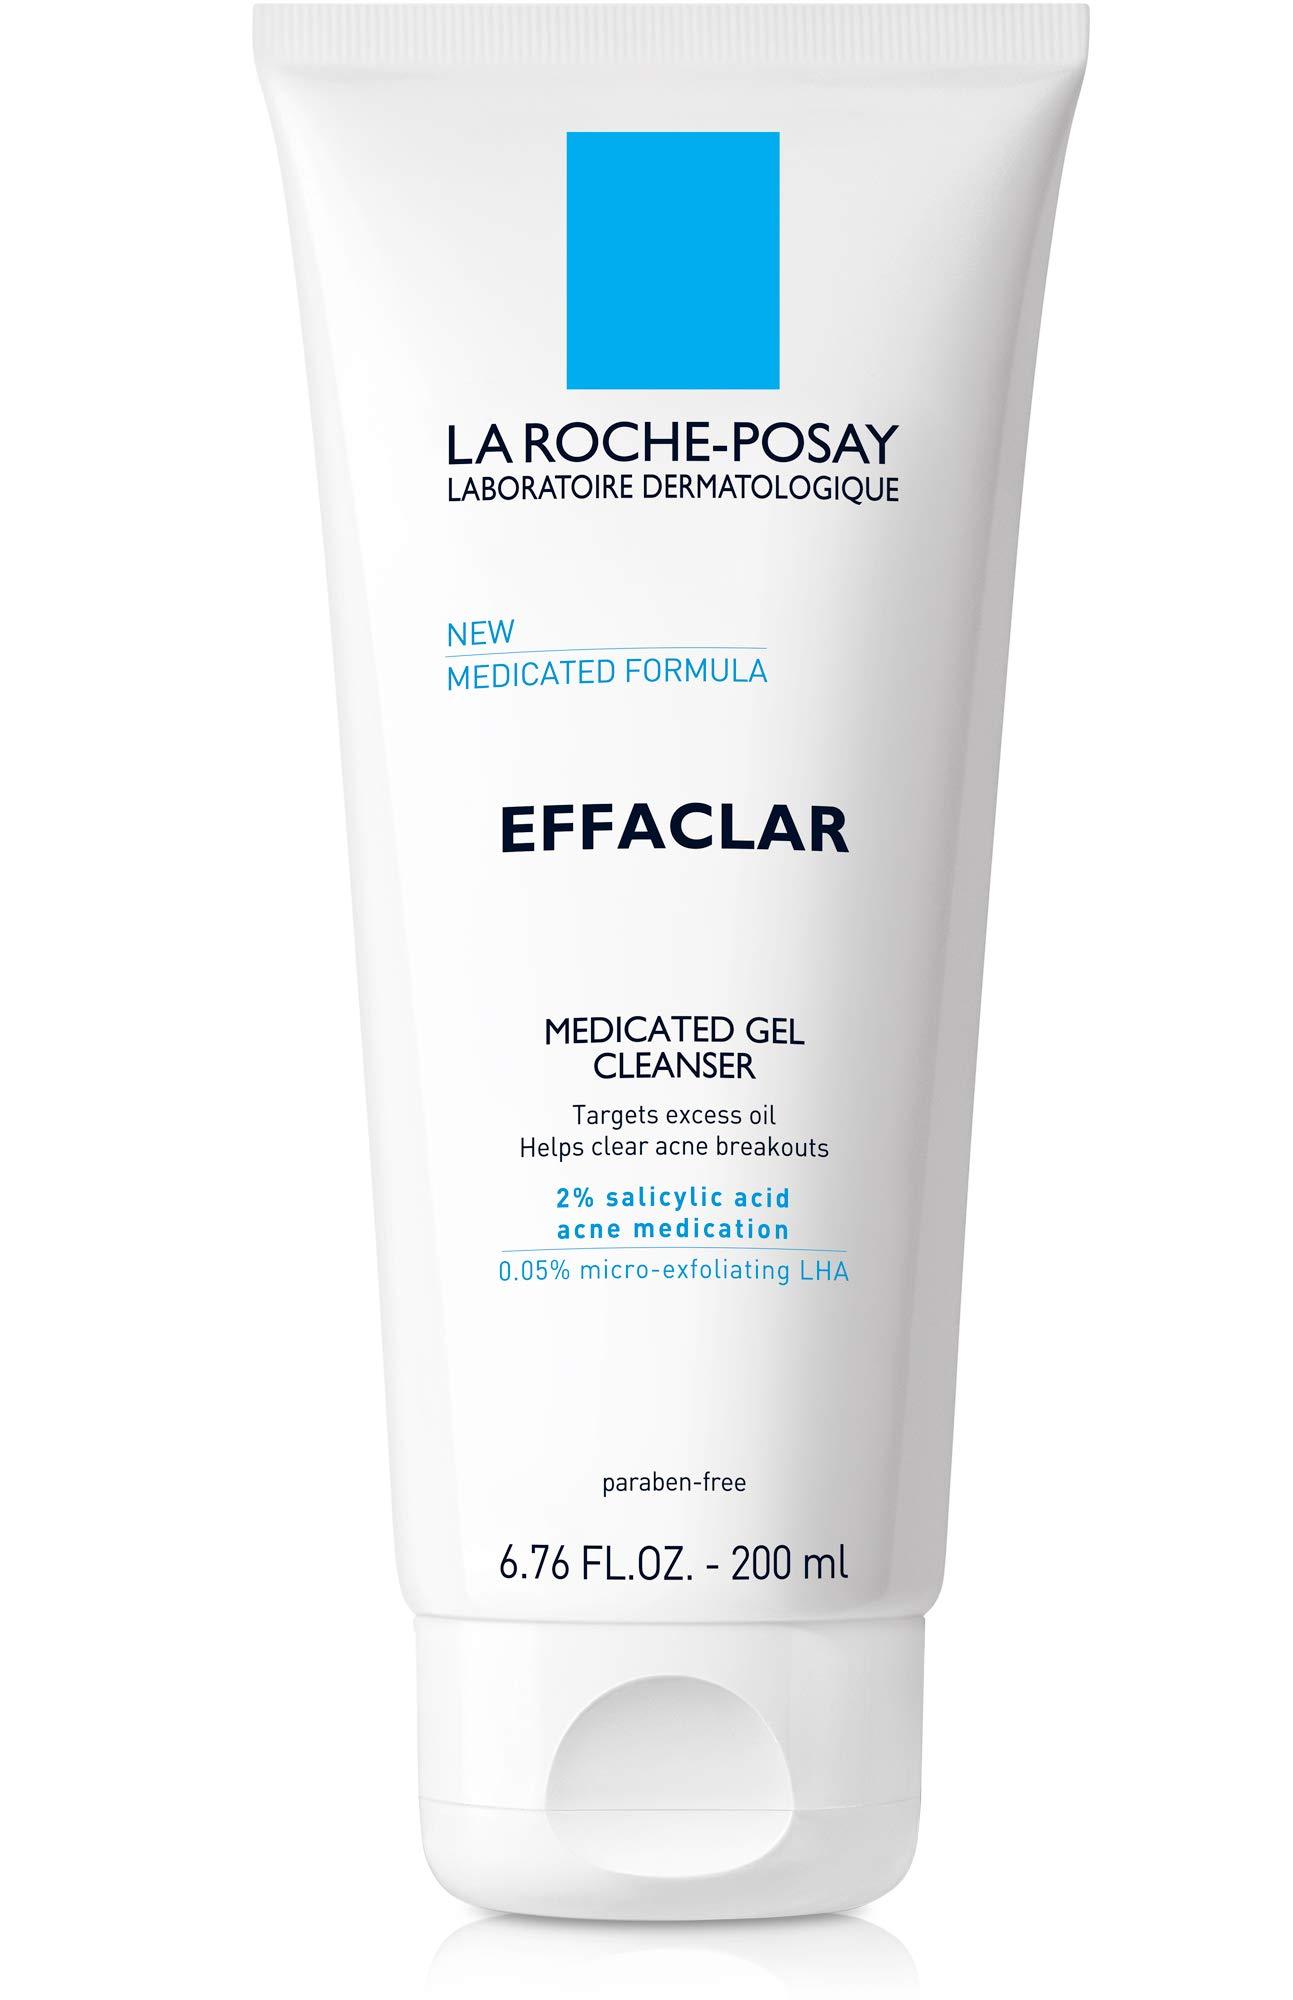 Sản phẩm sữa rửa mặt trị mụn tốt nhất hiện nay La Roche-Posay Effaclar Medicated Gel Cleanser